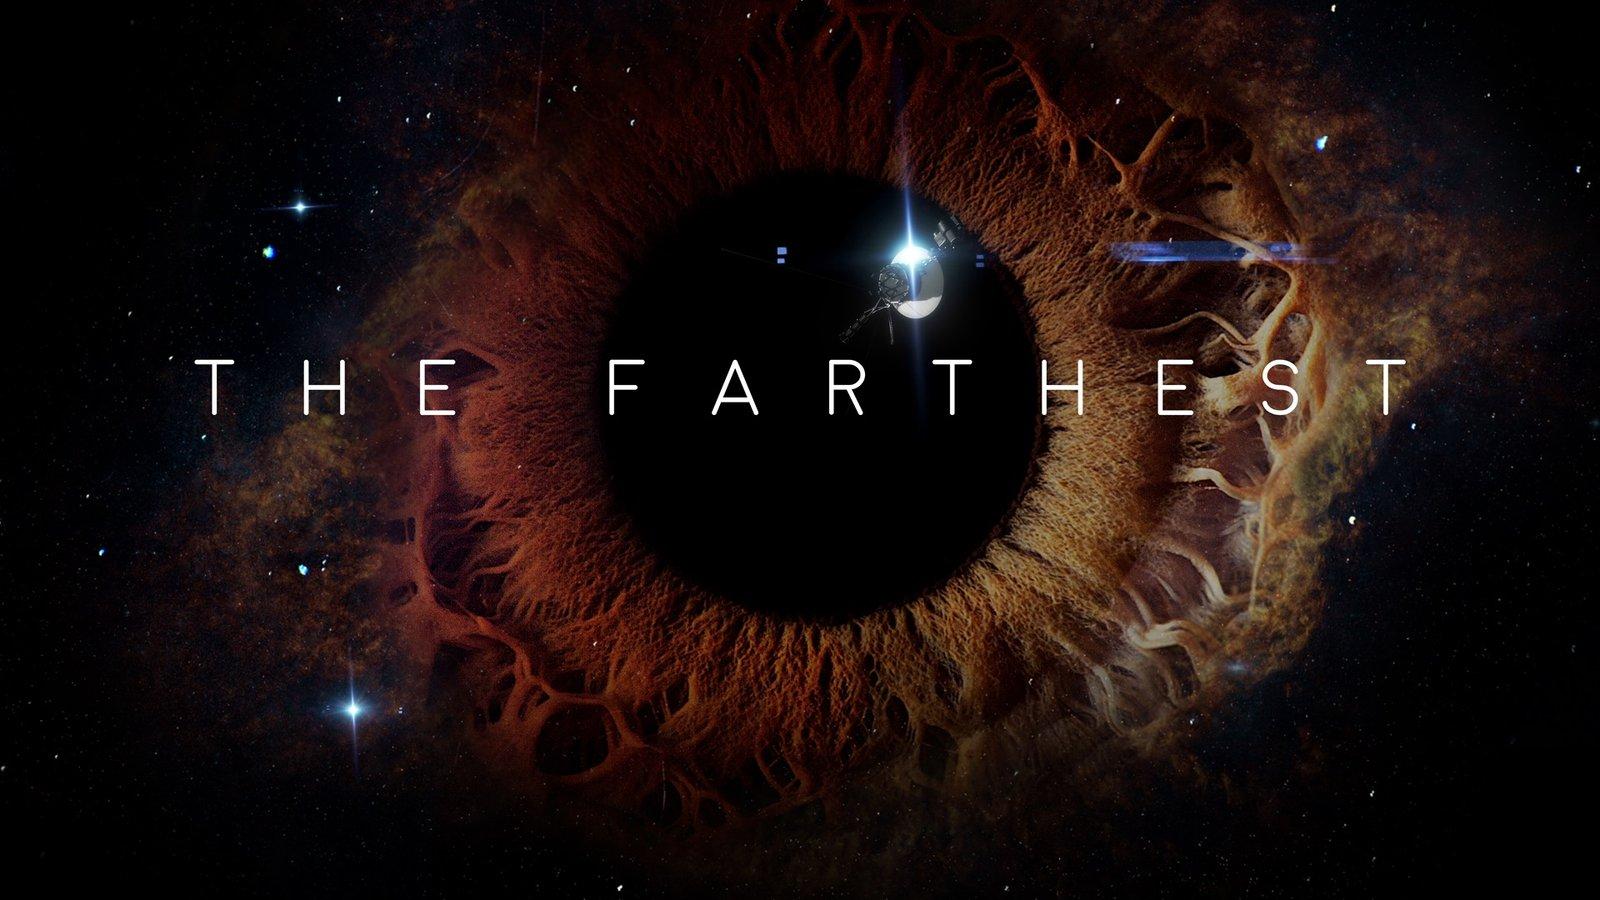 The Farthest - The Voyager Spacecraft